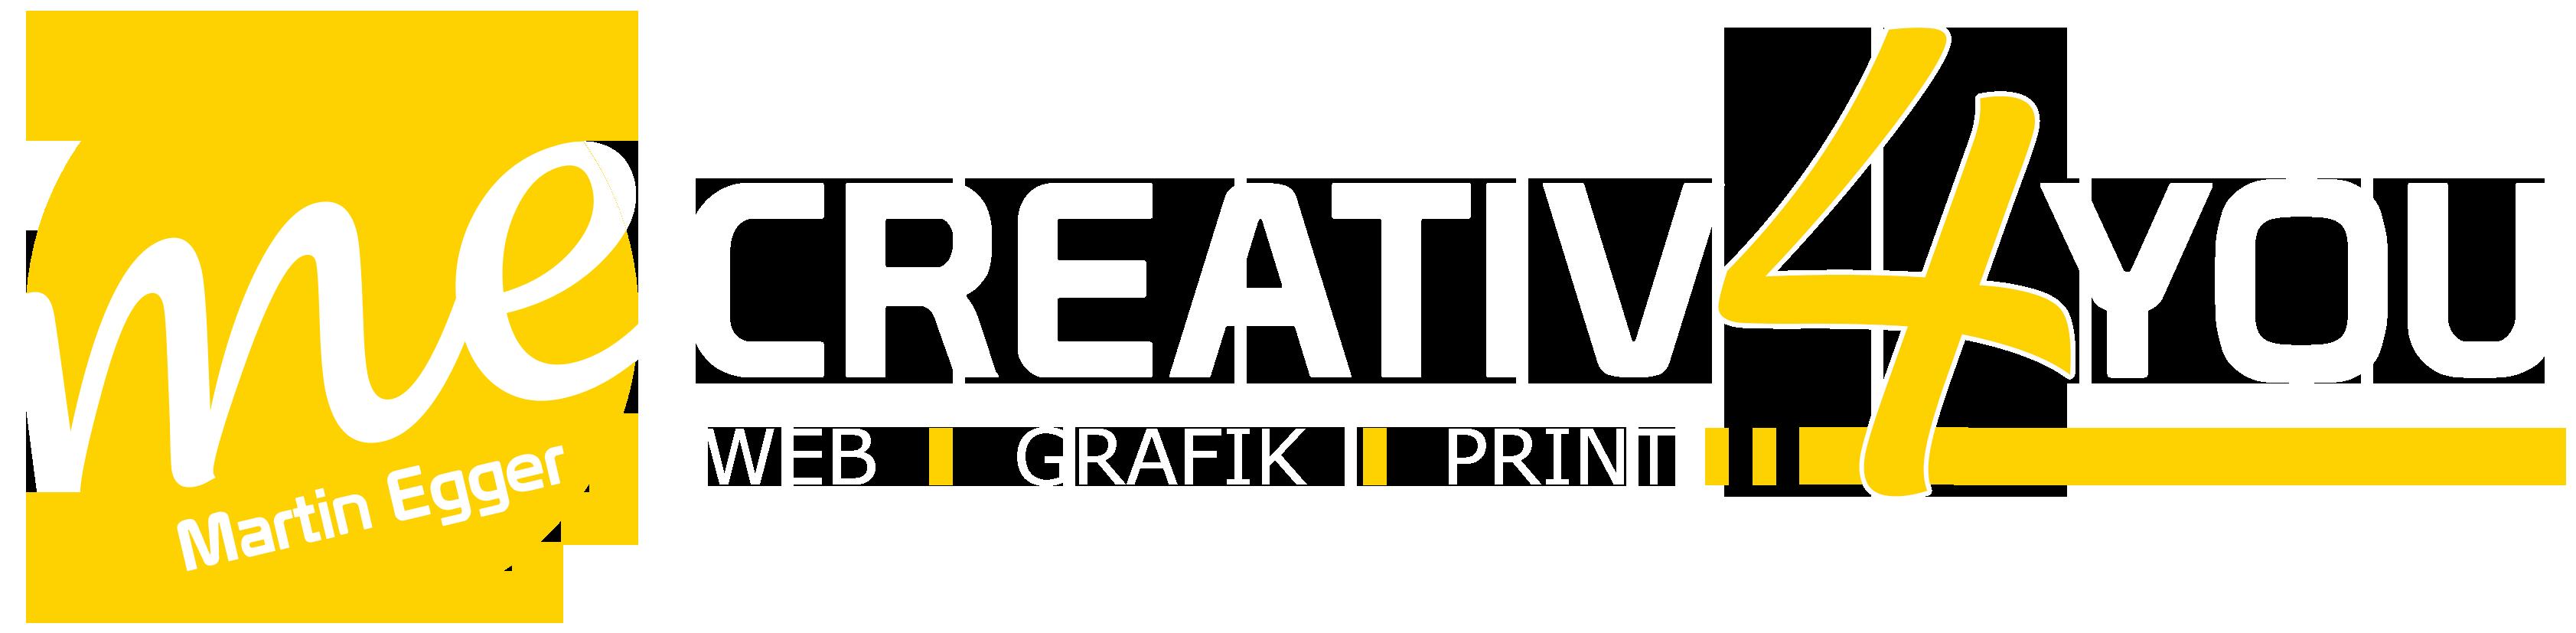 creativ4u.at